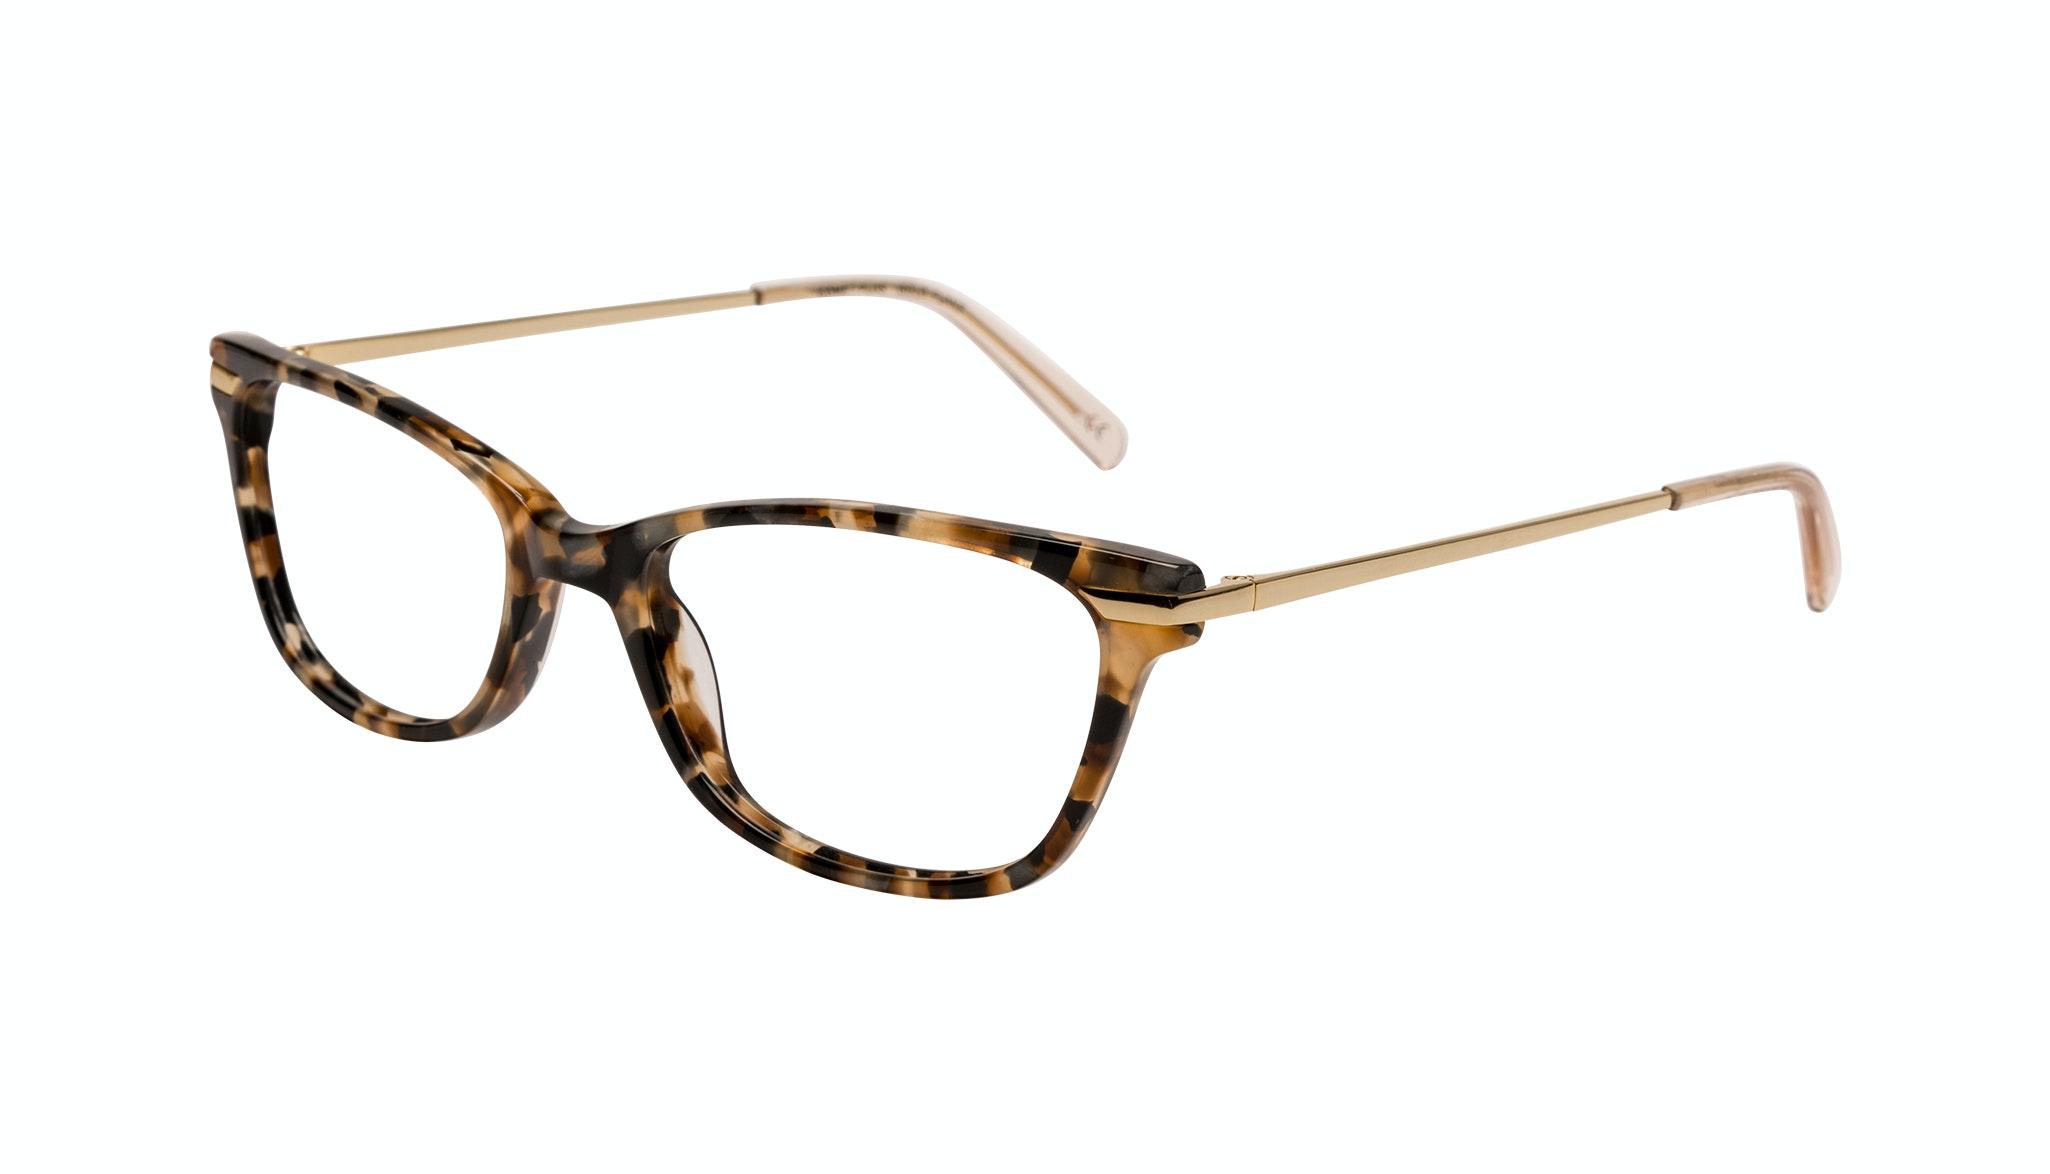 Affordable Fashion Glasses Rectangle Eyeglasses Women Comet Plus Gold Flake Tilt